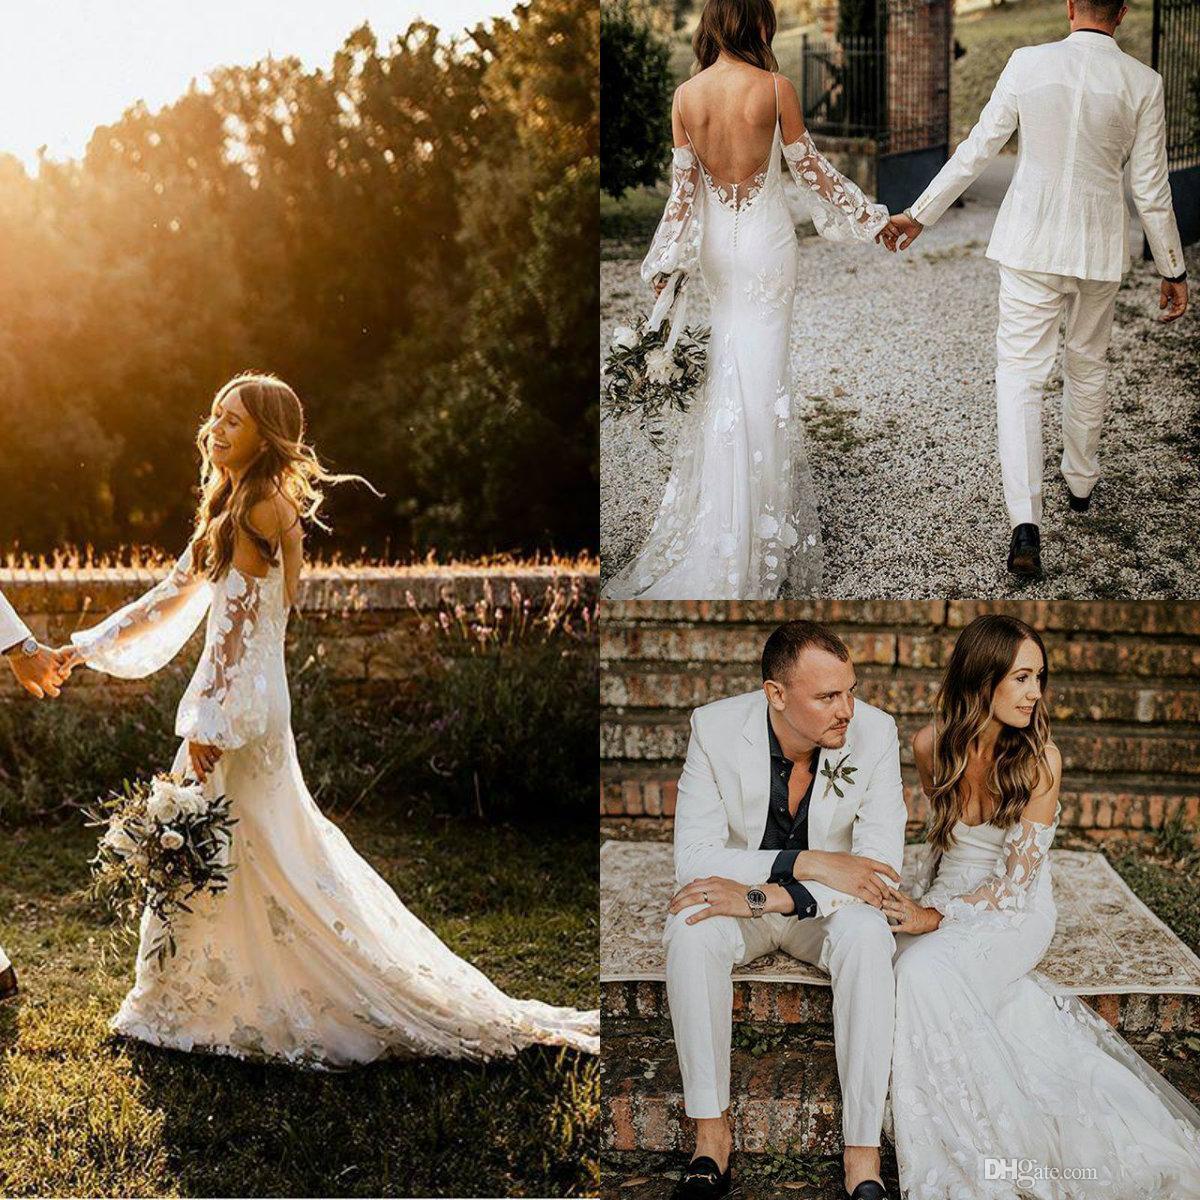 4c6b3d53466f Bohemian Lace Wedding Dresses 2019 Illusion Long Sleeve Hippie Style Boho Bridal  Gowns Fashion Beach Vestido De Noivas Sexy Backless Dress Dress Dresses ...